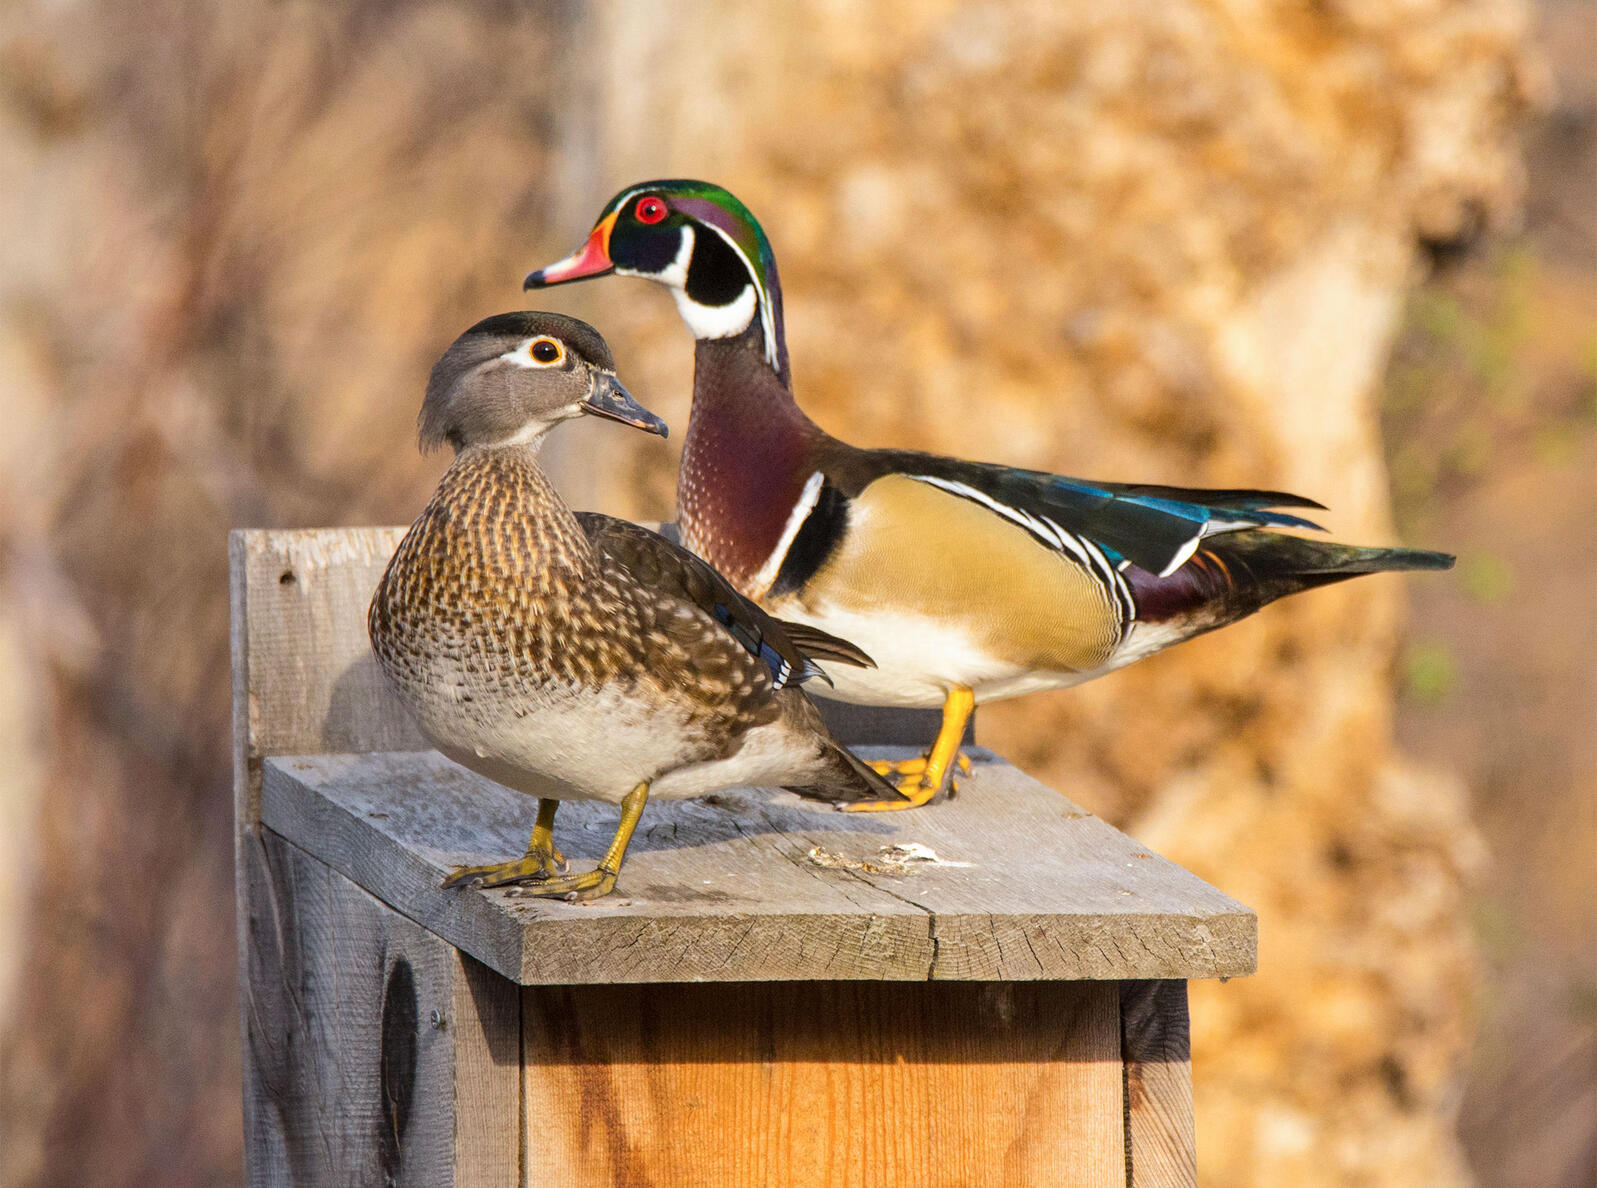 Wood Ducks. Steve Bly/Alamy